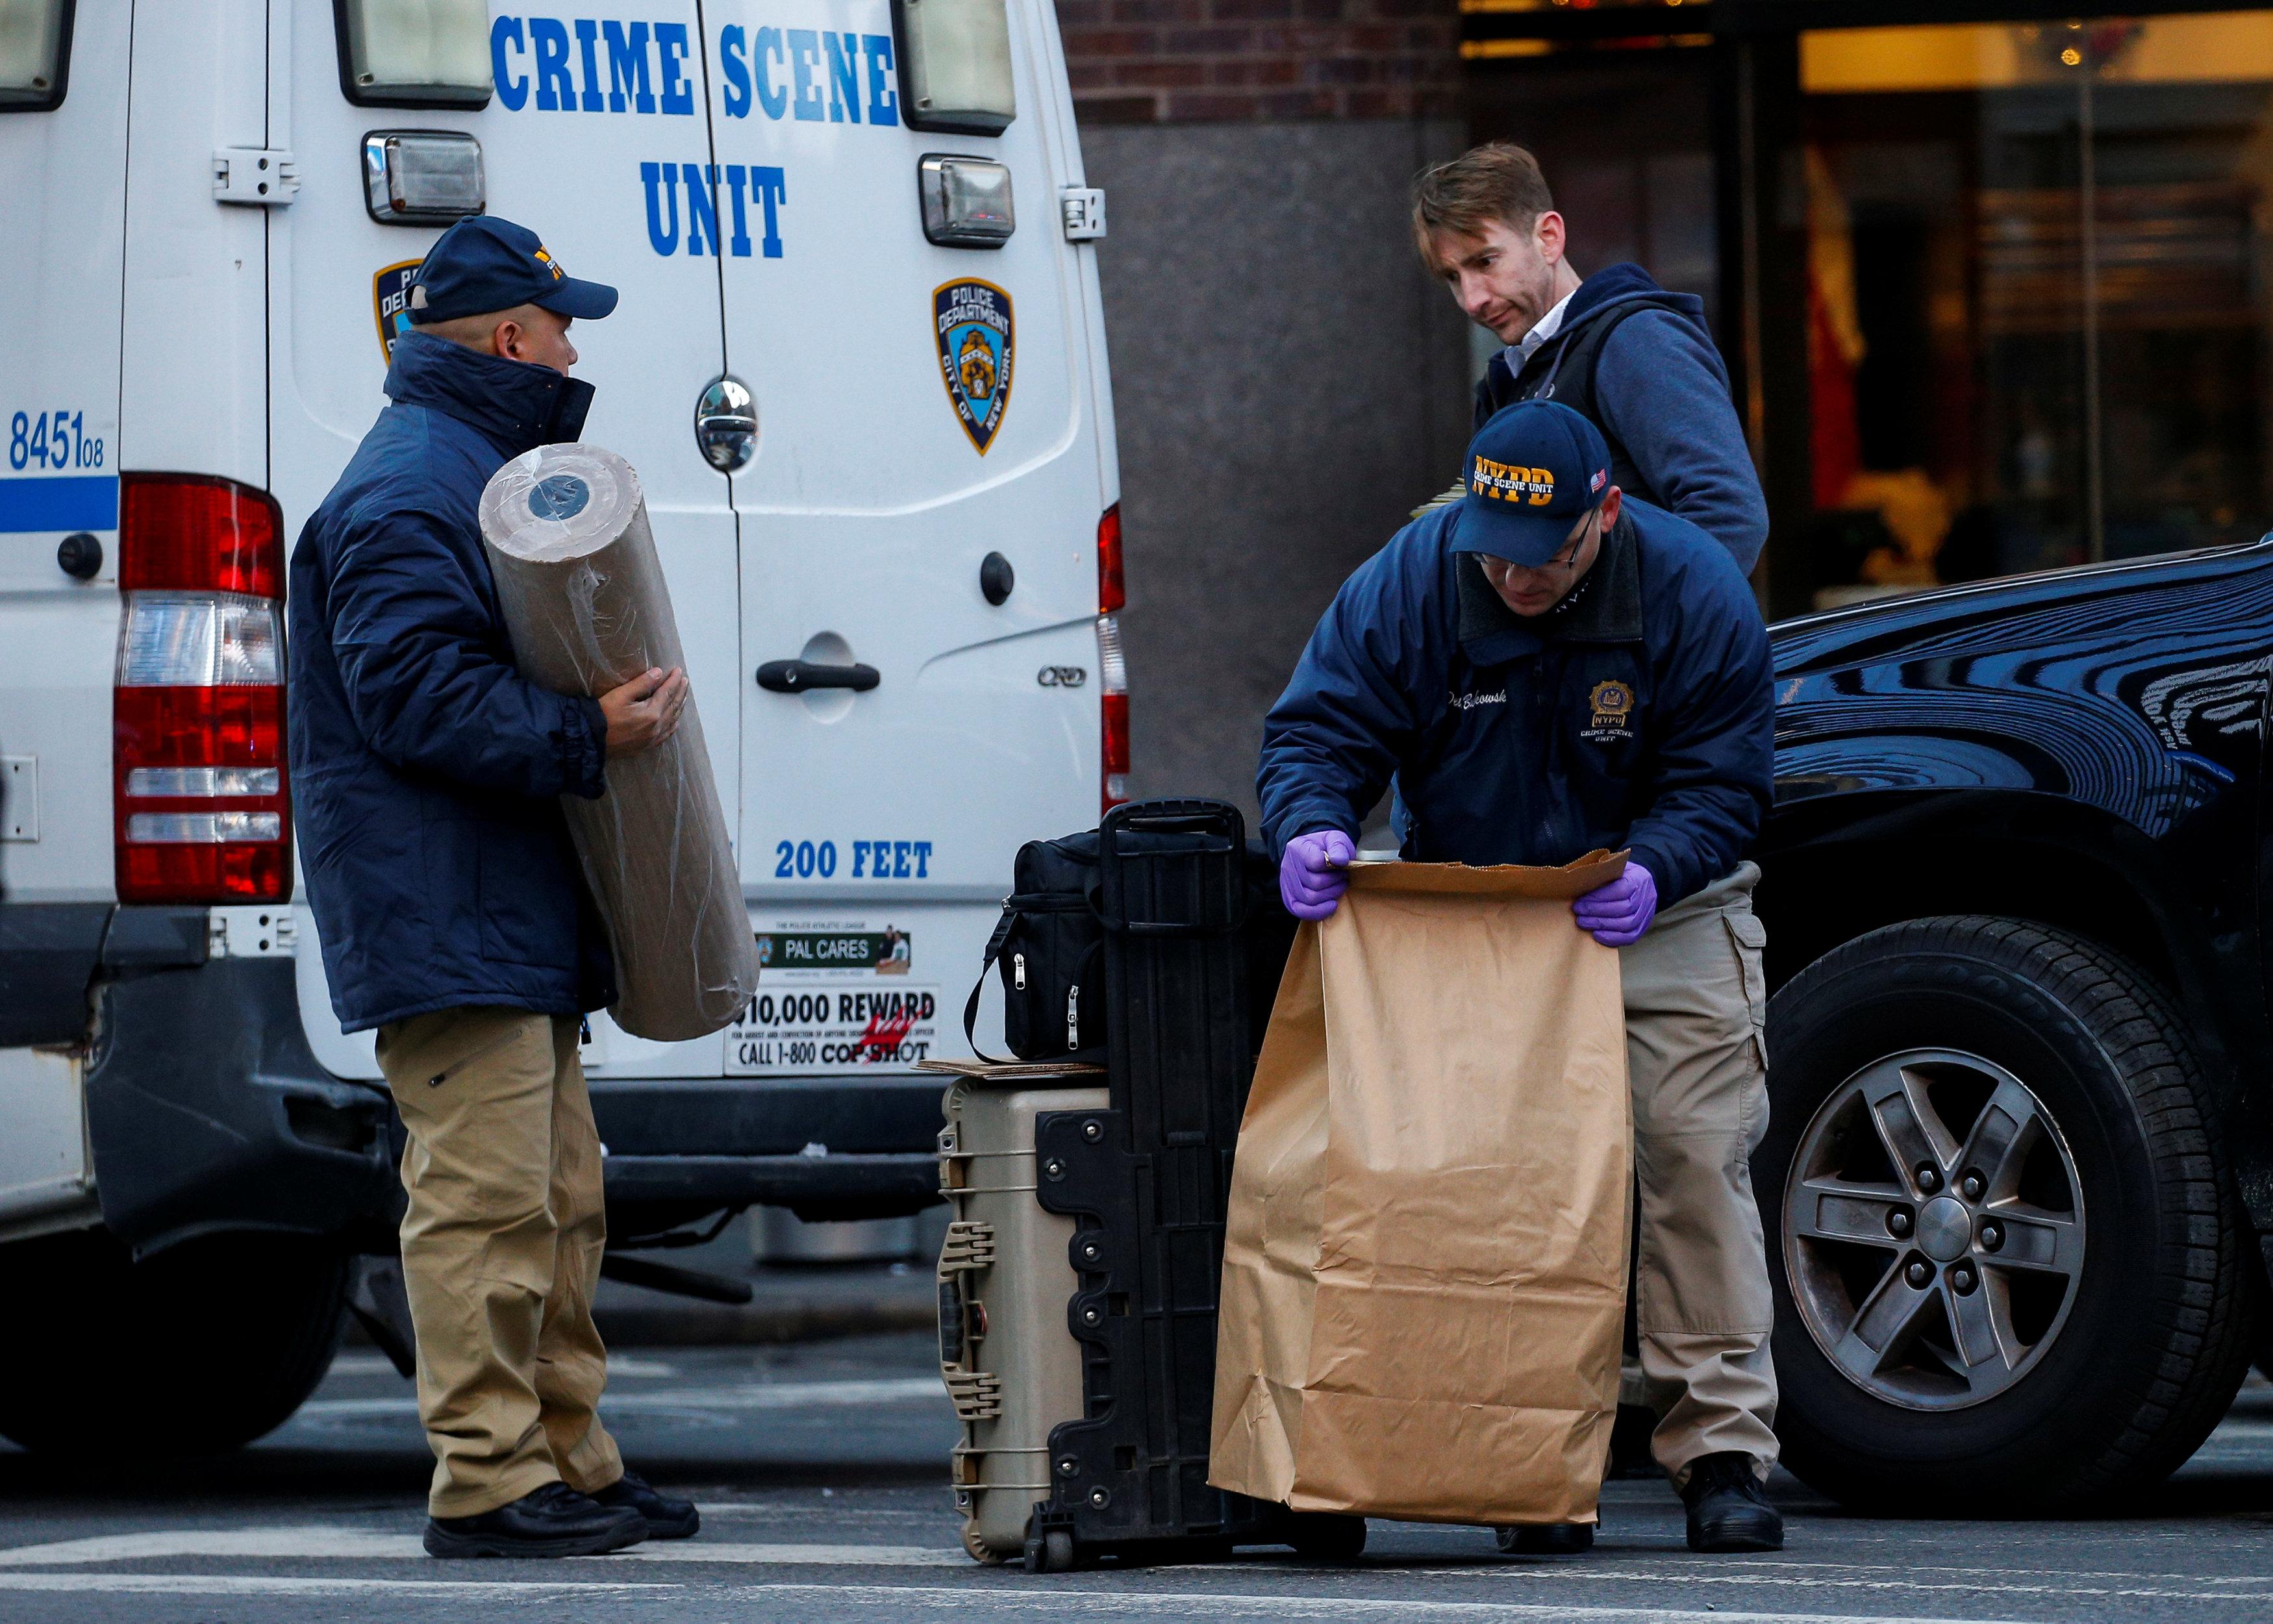 Explosion rocks New York commuter hub, suspect in custody